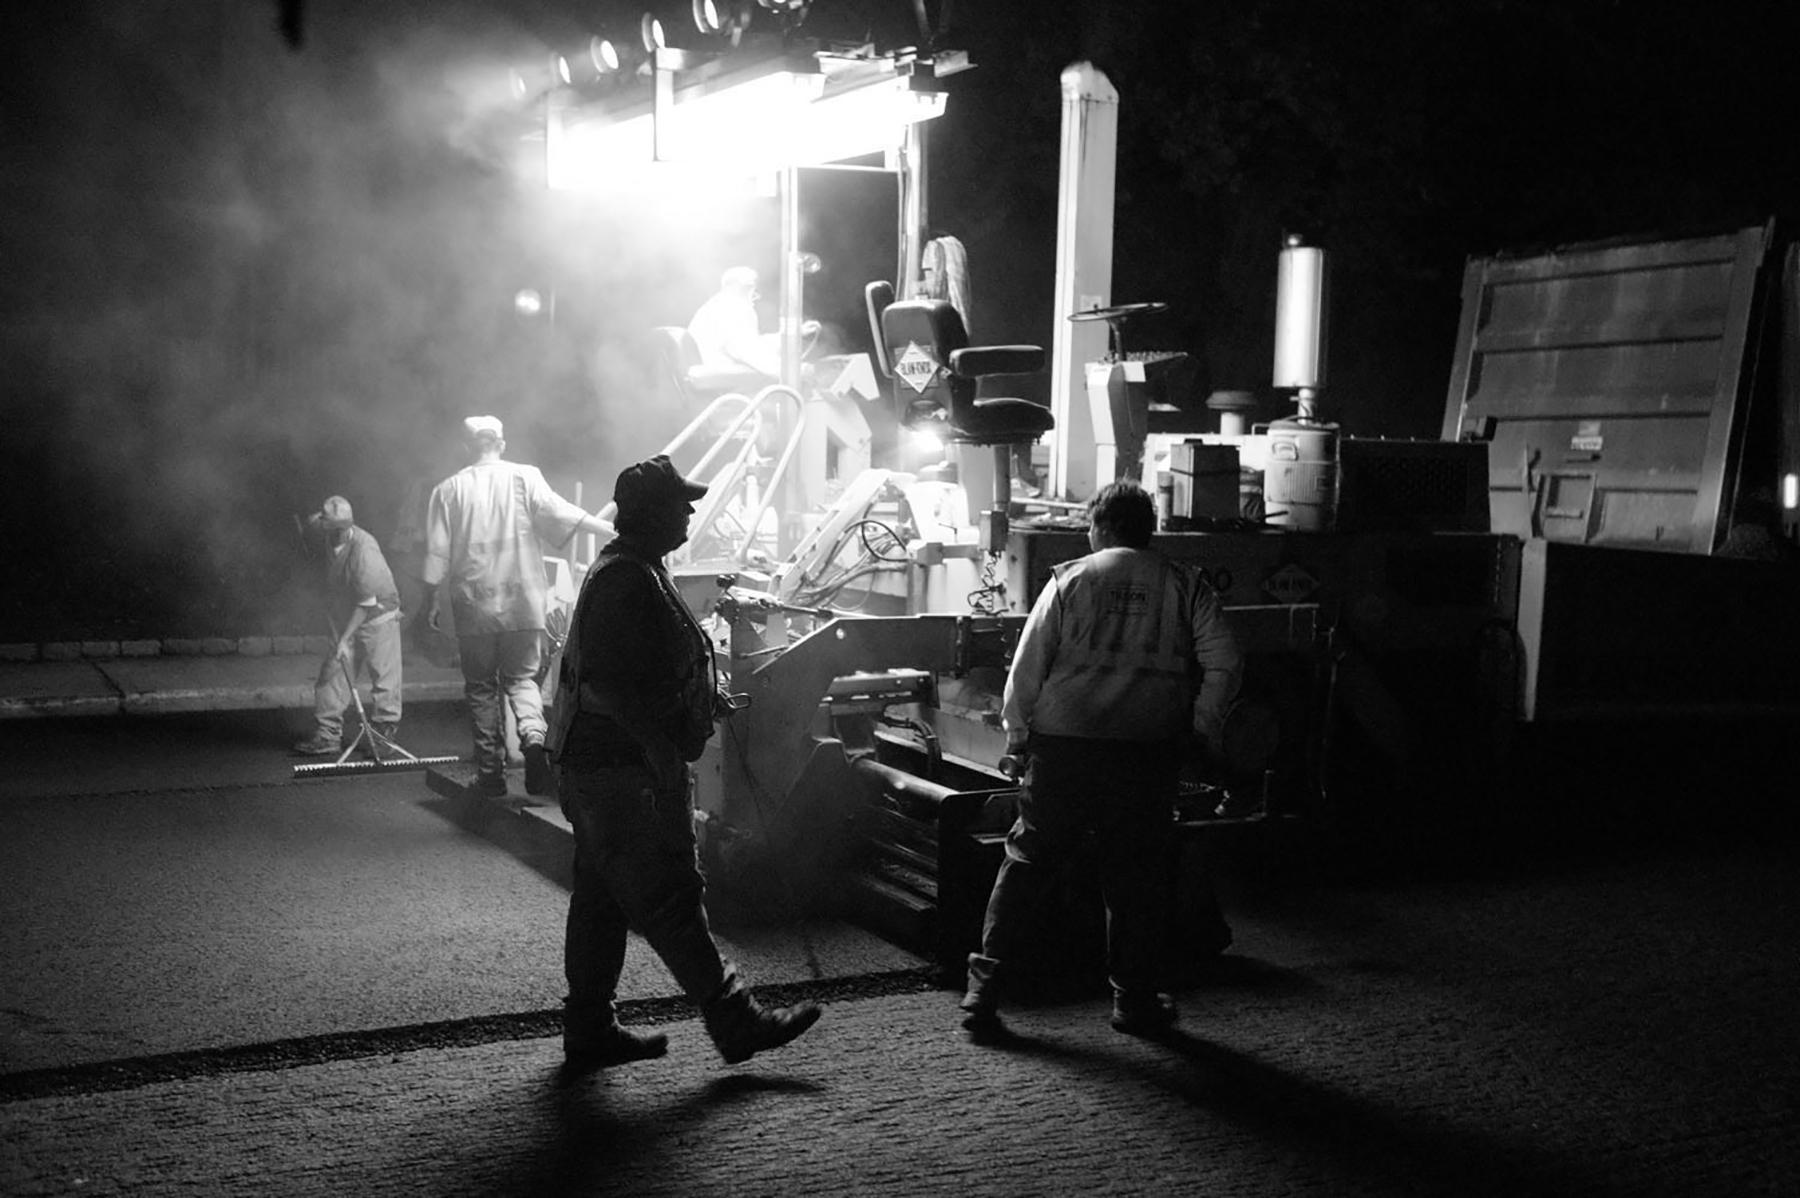 Road Crew, 2004